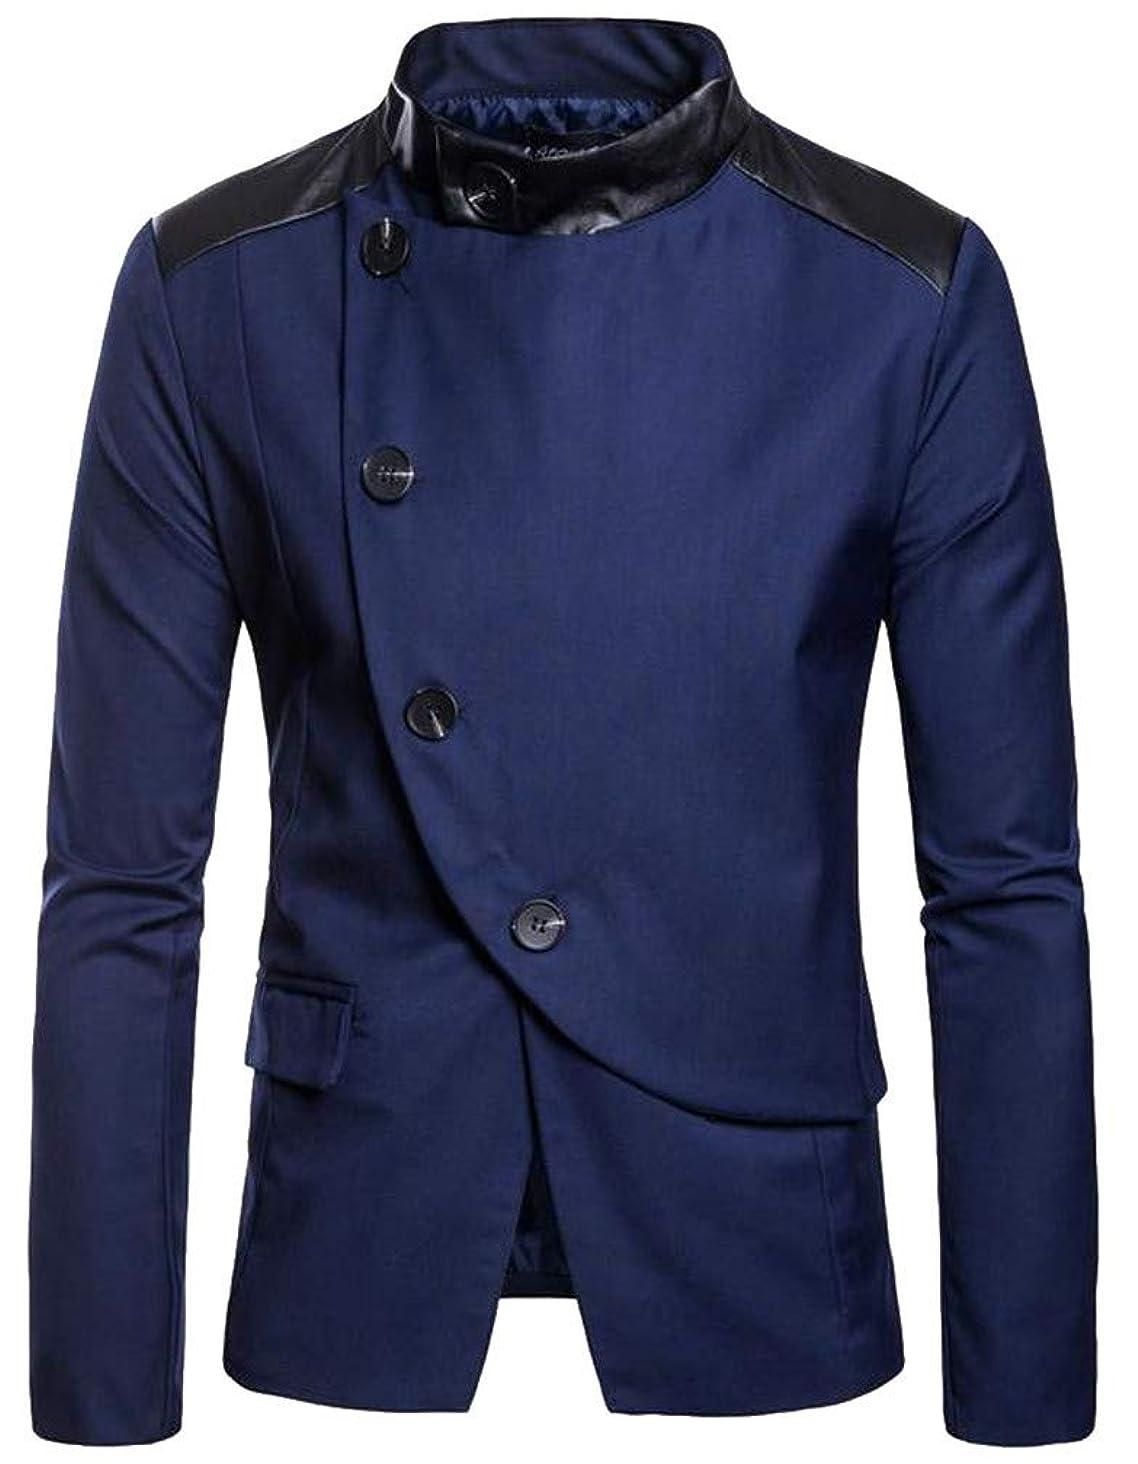 Cromoncent Men's Irregular Stand Collar Button Casual Blazer Coat Jacket